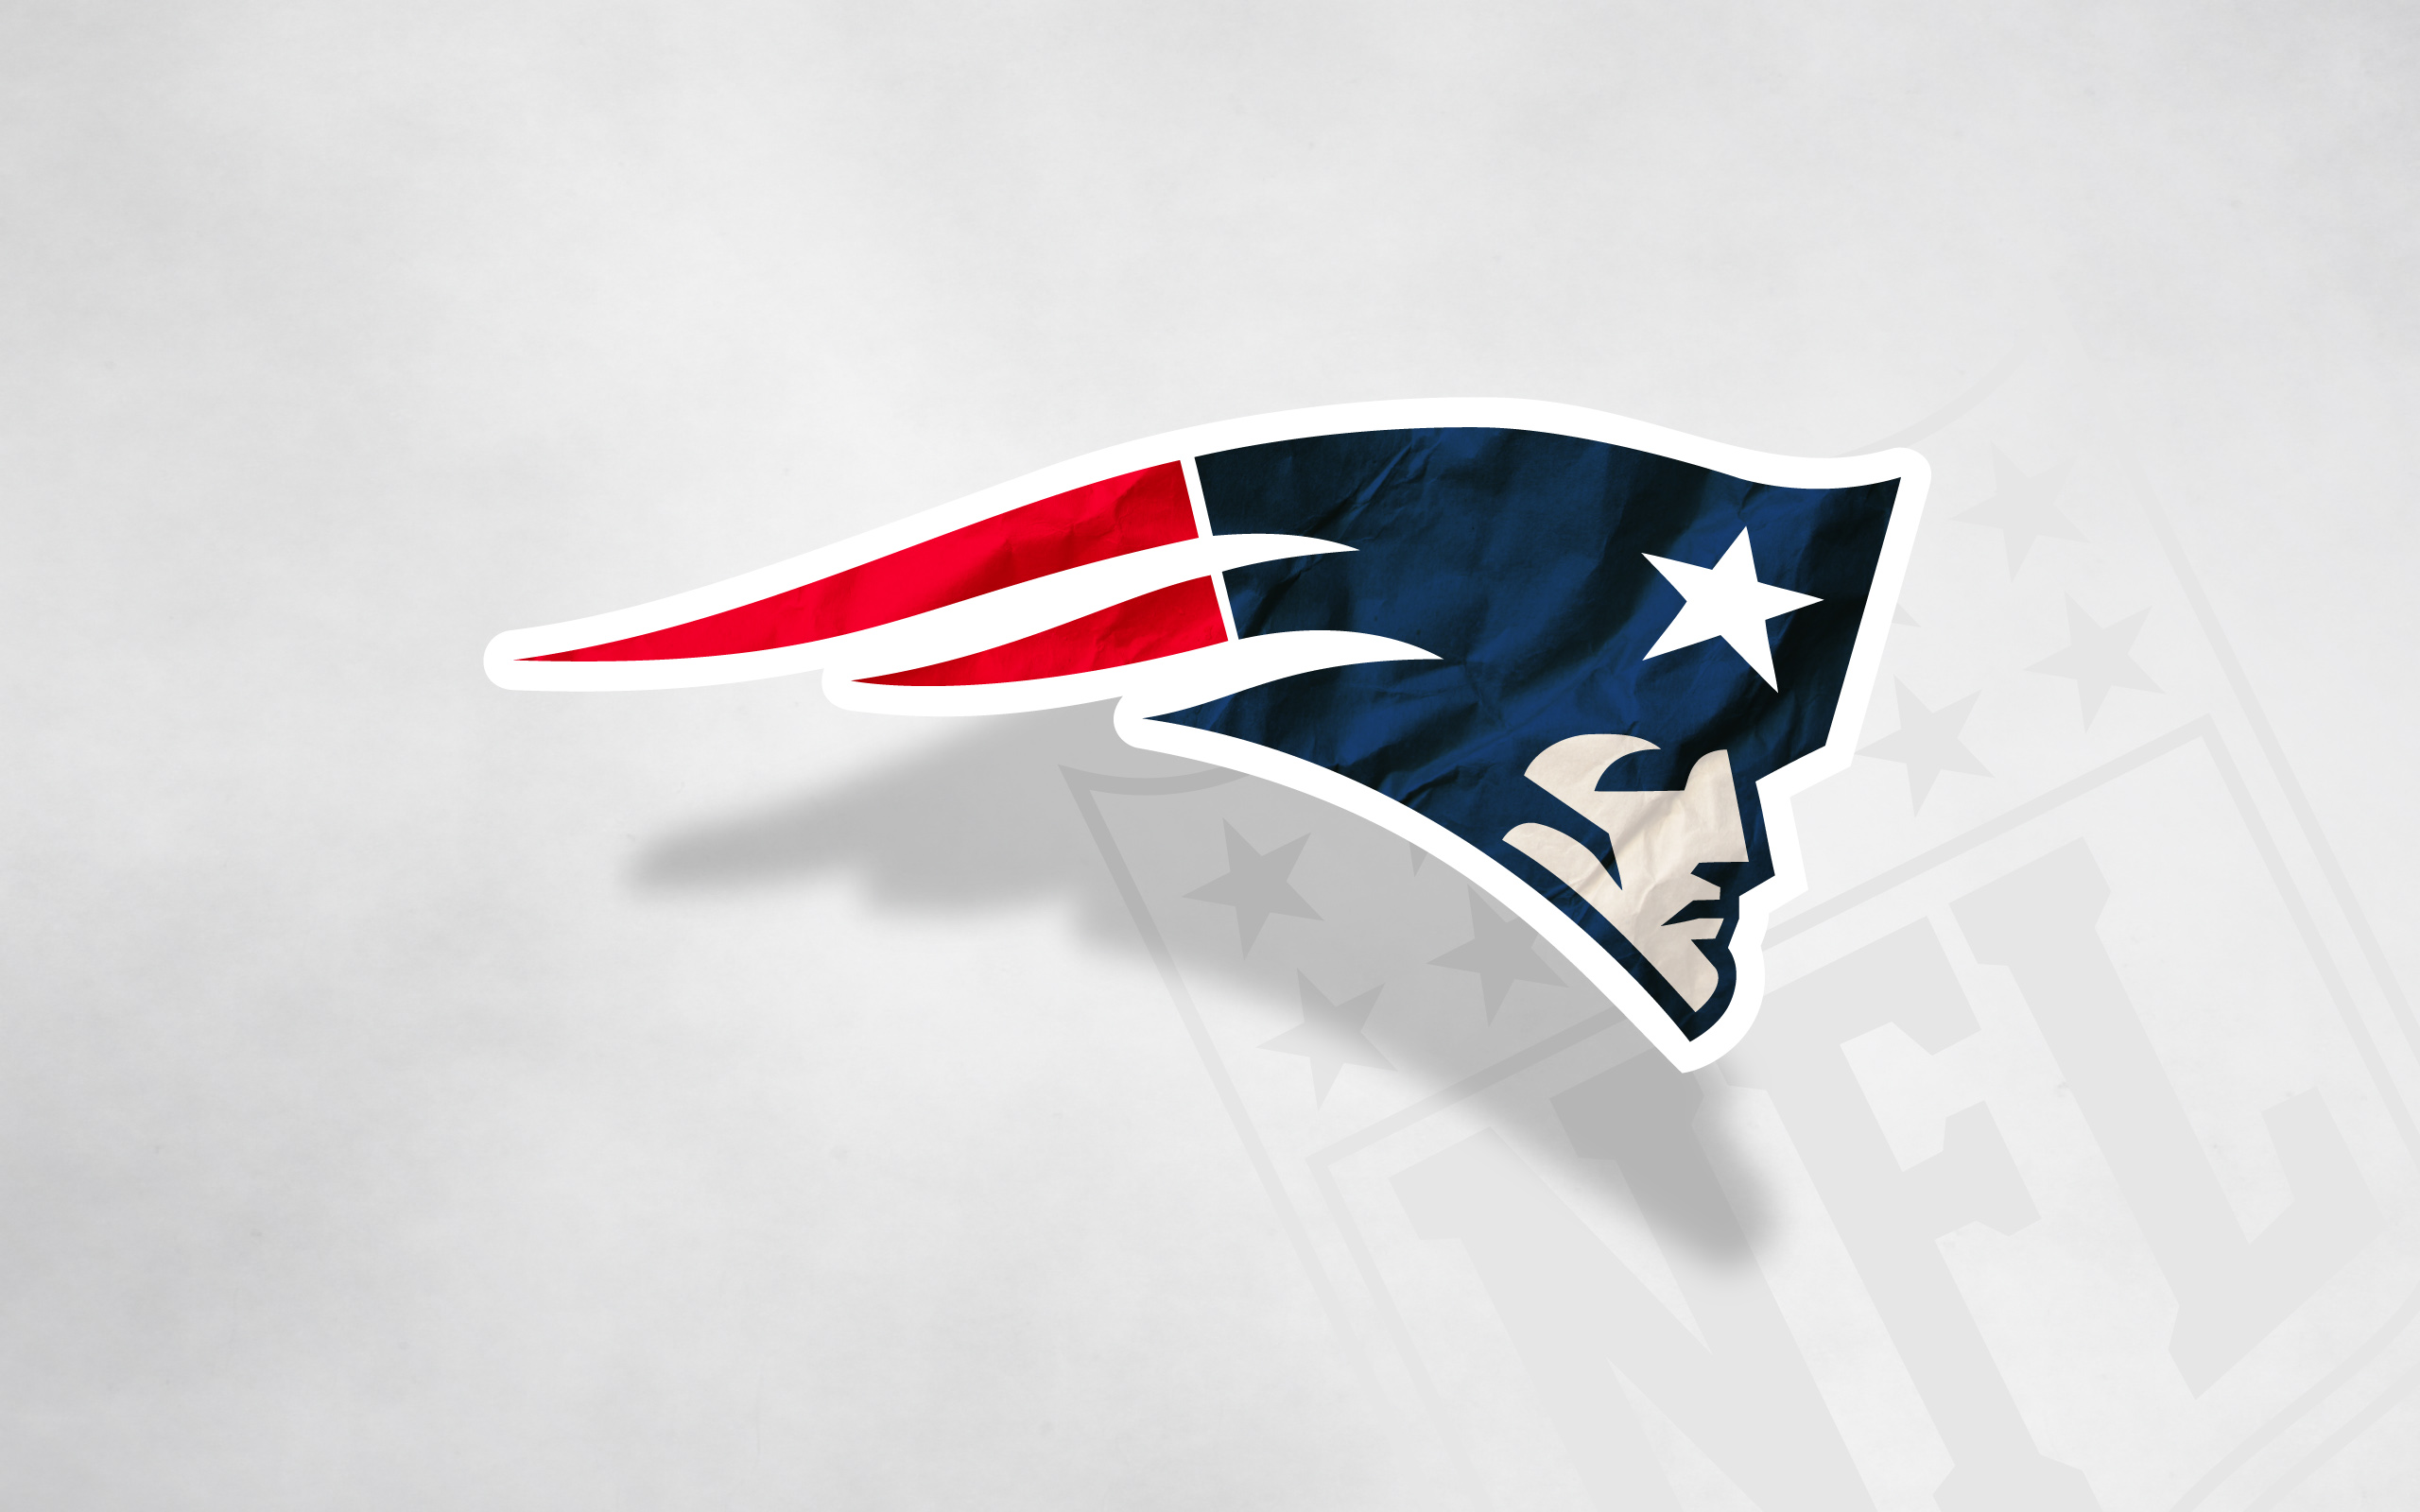 Sport HD Hintergrundbilder New England Patriots Wallpapers 2560x1600